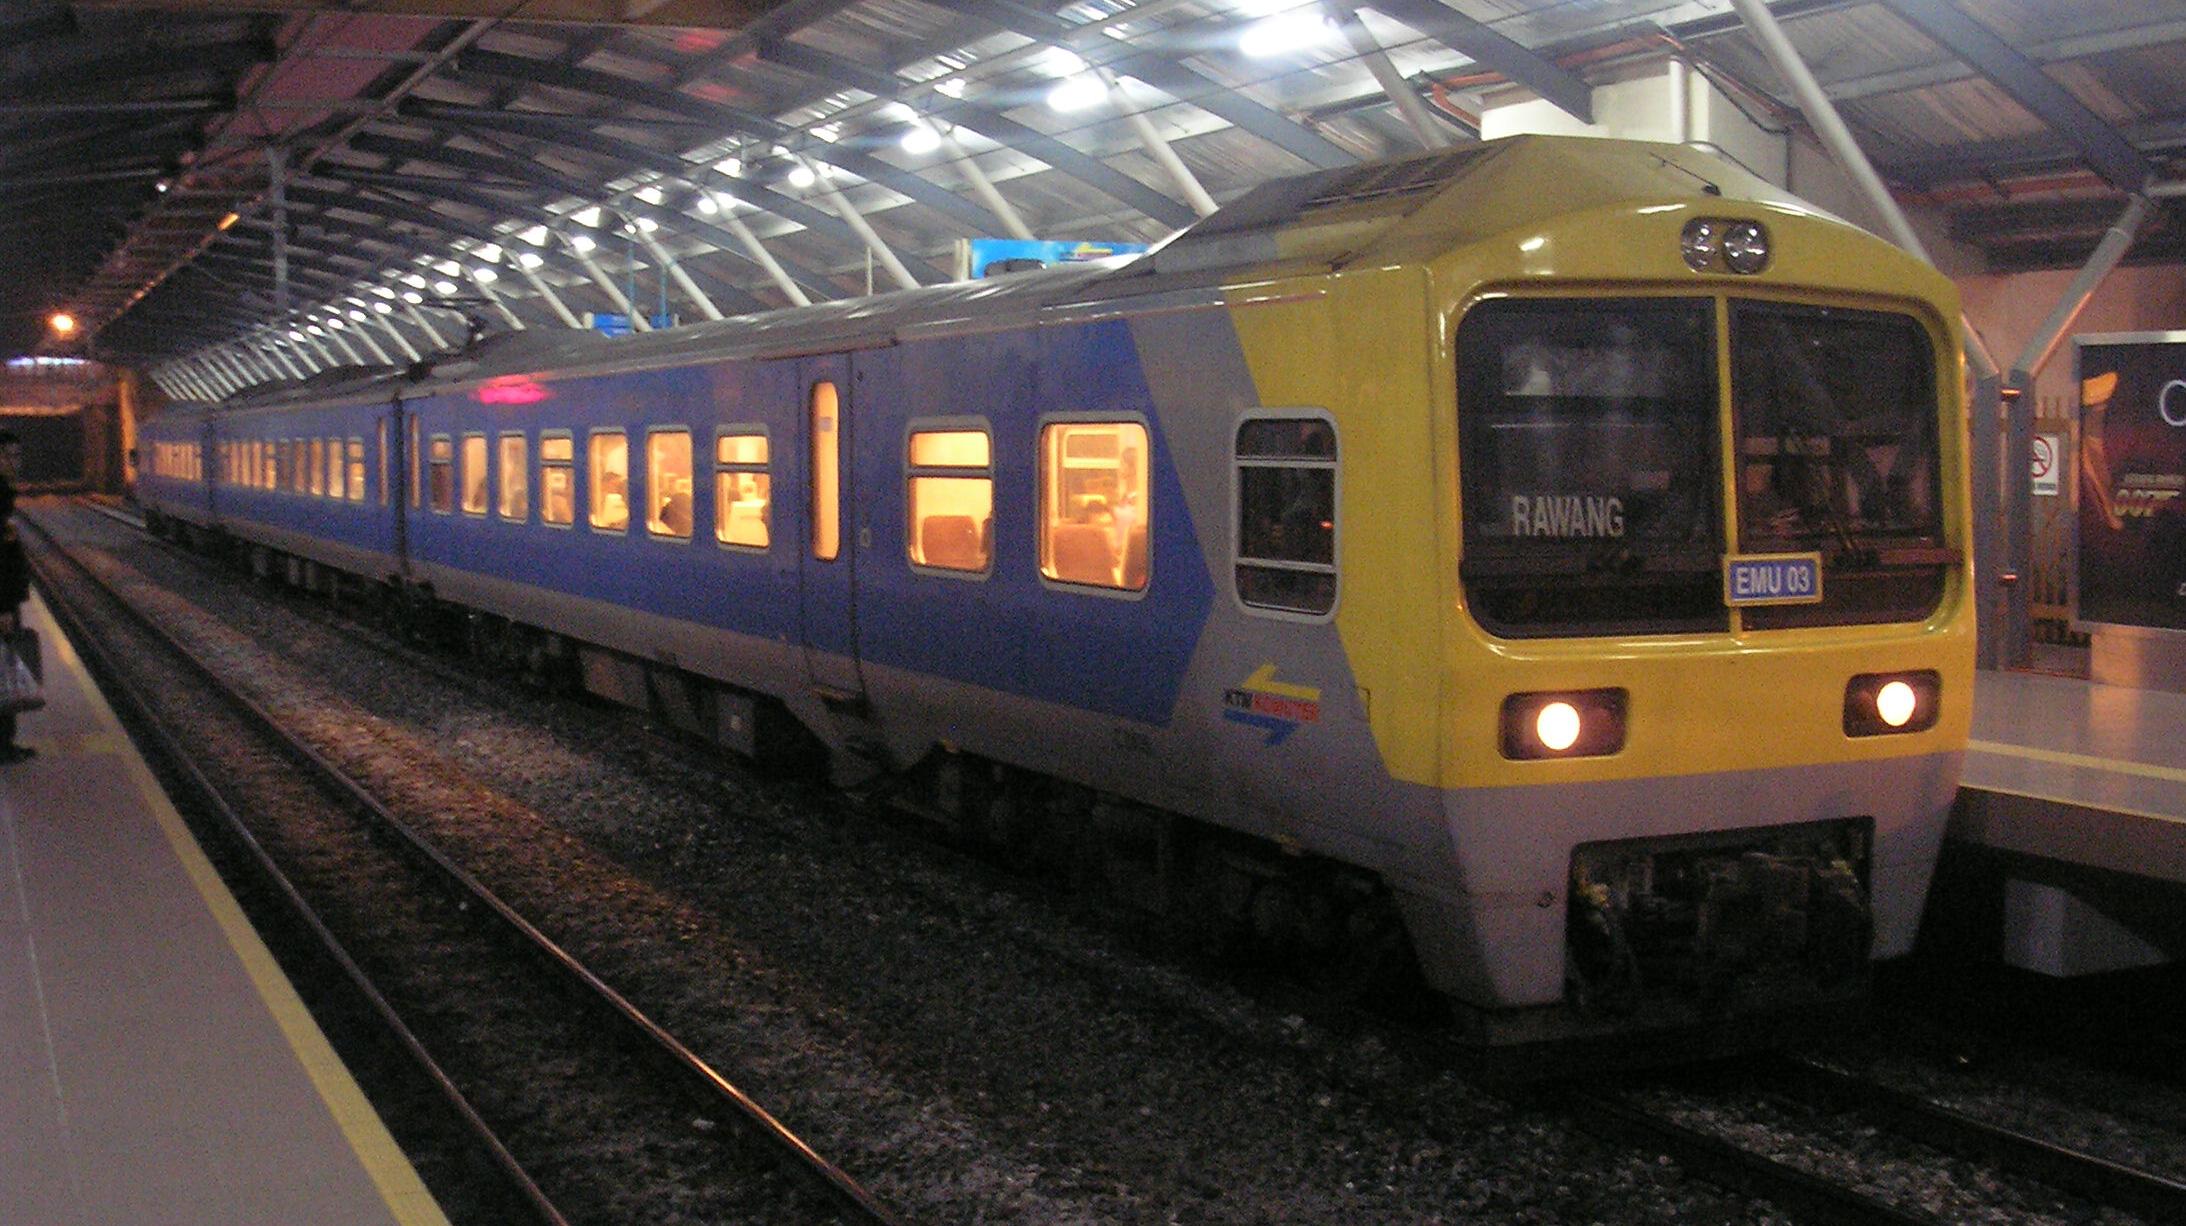 Ktm Wikipedia >> File:Class 81 KTM Komuter train, Kuala Lumpur.jpg ...